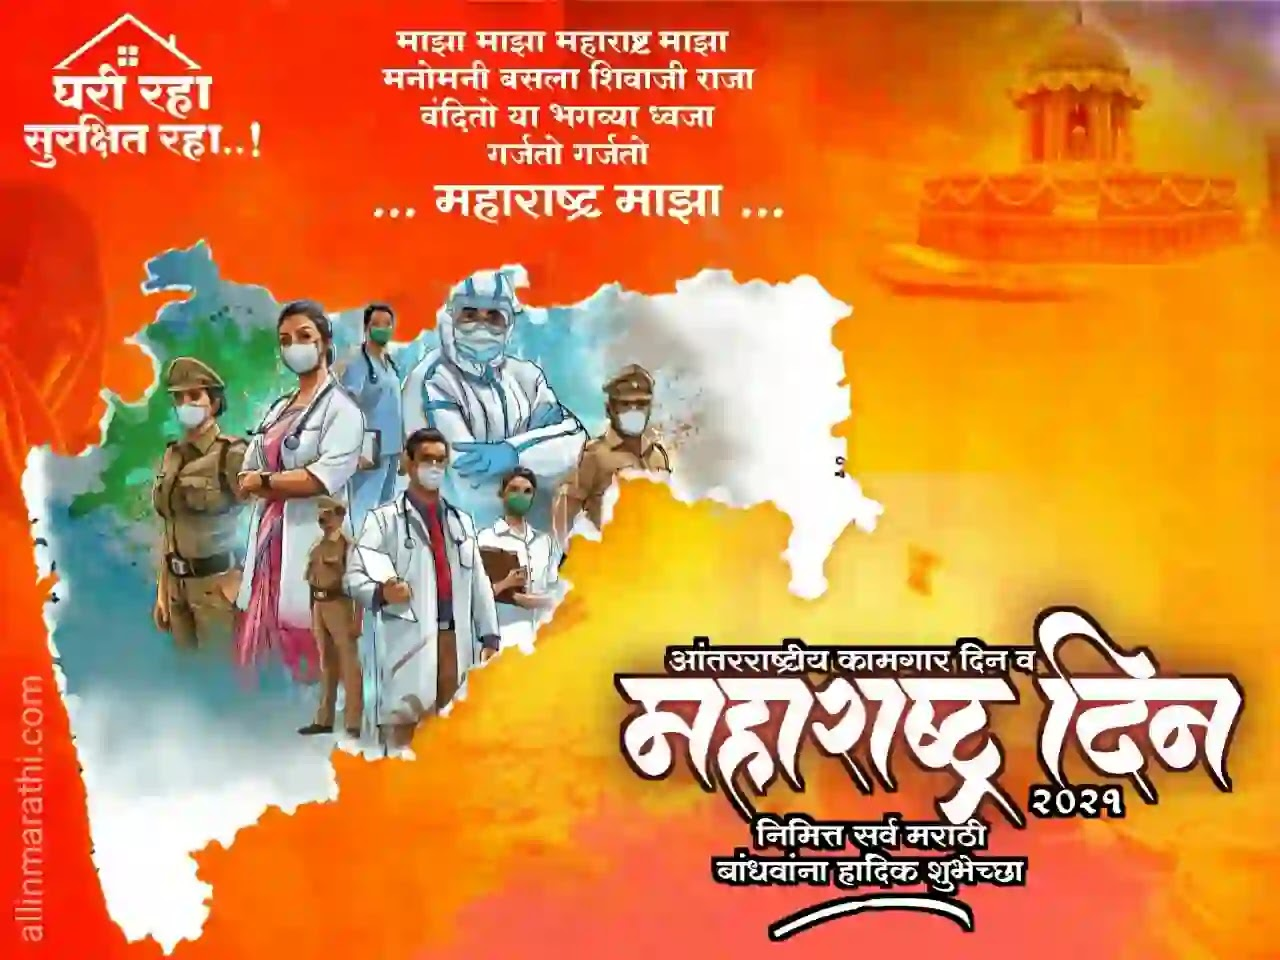 Maharashtra-din-status-marathi